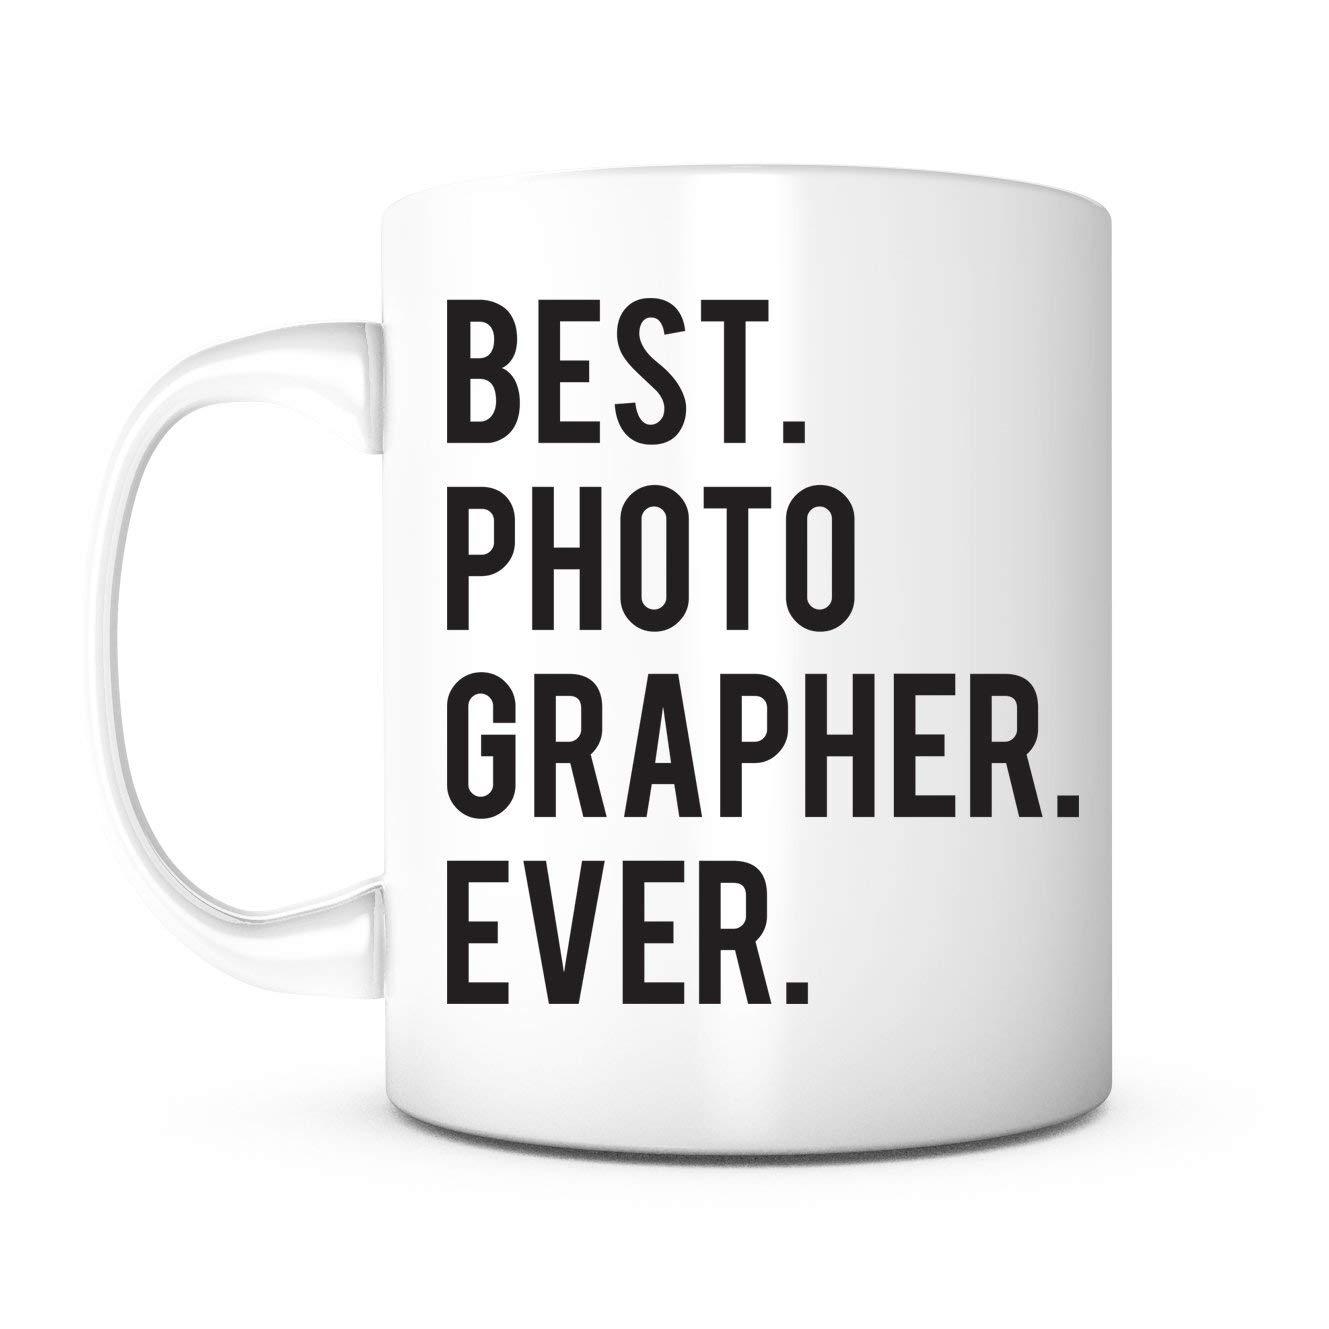 Best Photographer Ever-Photographer Gift,Photographer Assistant Gift,Coffee Mug,Office Mug,Photographer Mug,Photojournalist Gift,Christmas Gift,Birthday Anniversary Gift,Gift for Photographer